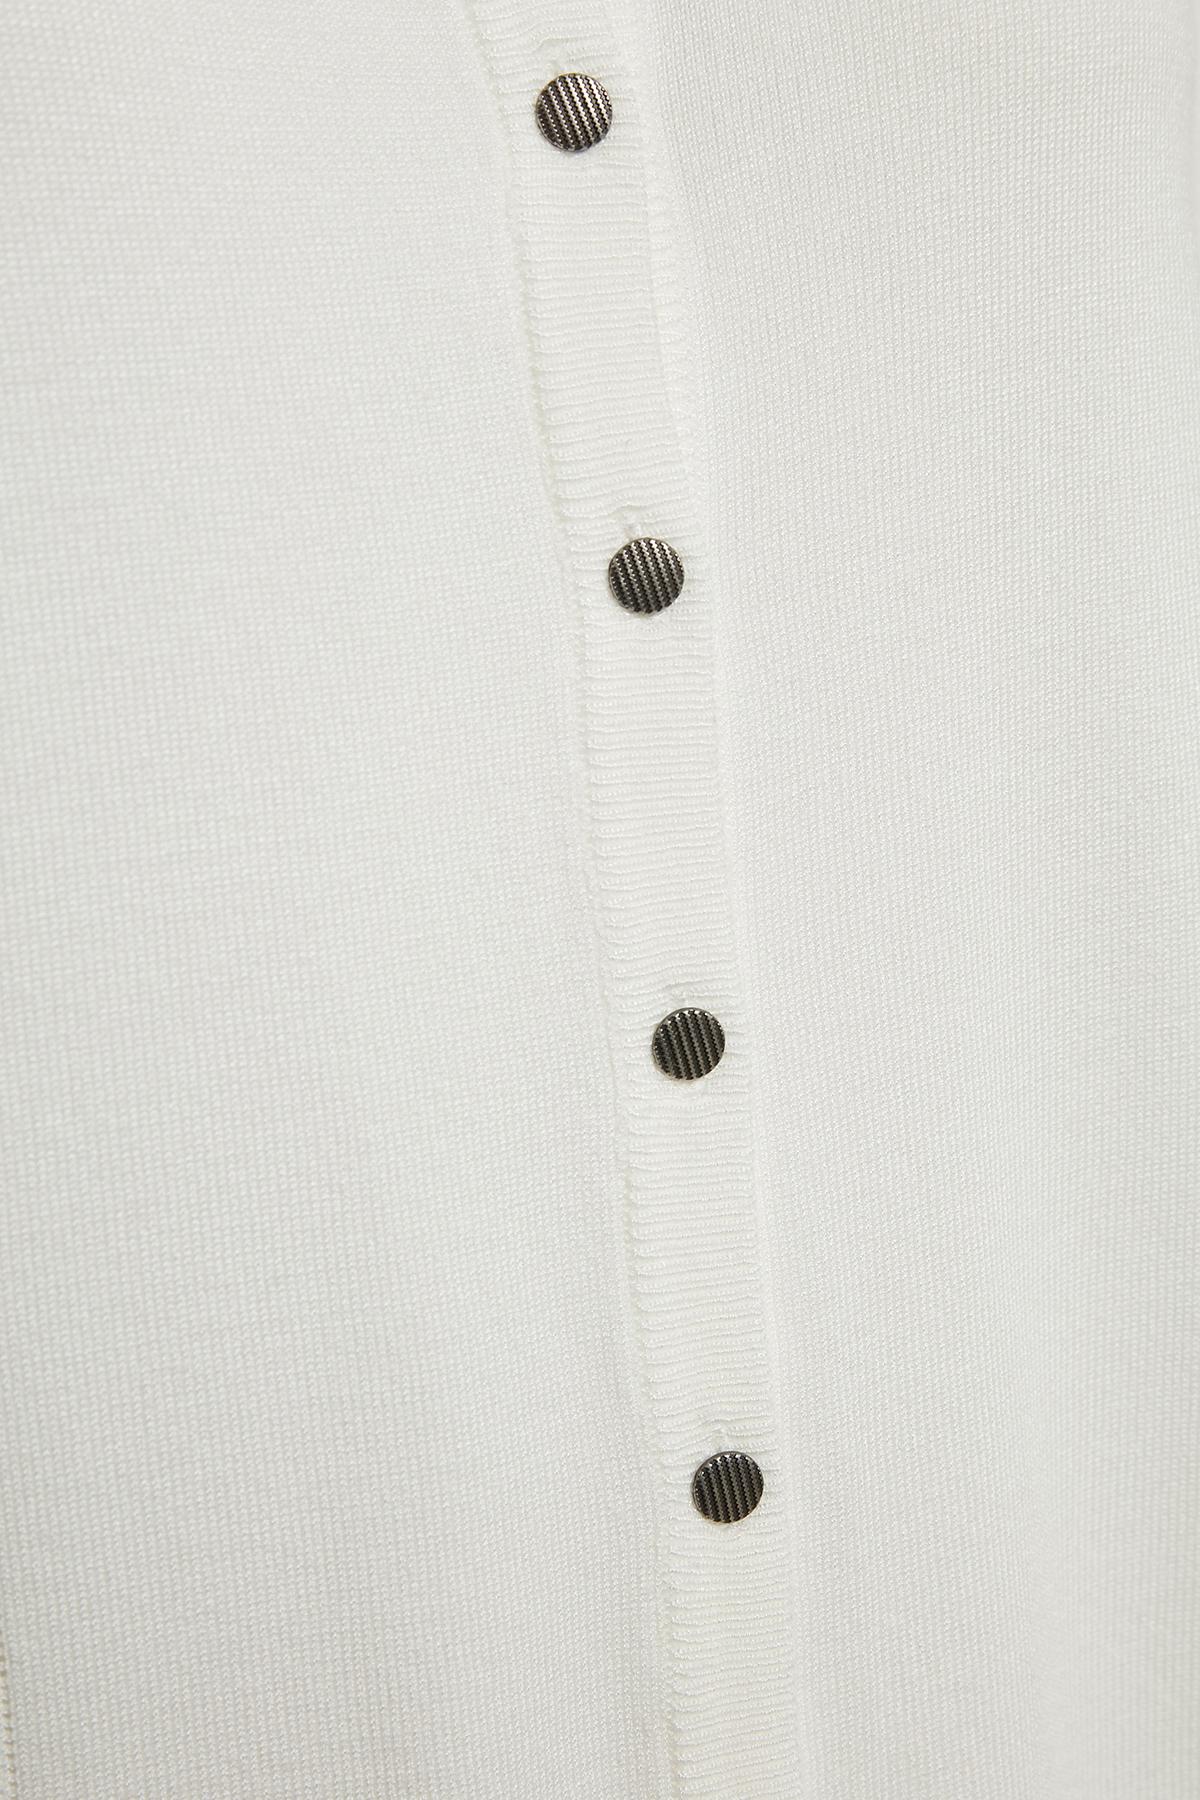 Soft Cream Strikcardigan – Køb Soft Cream Strikcardigan fra str. XS-XXL her